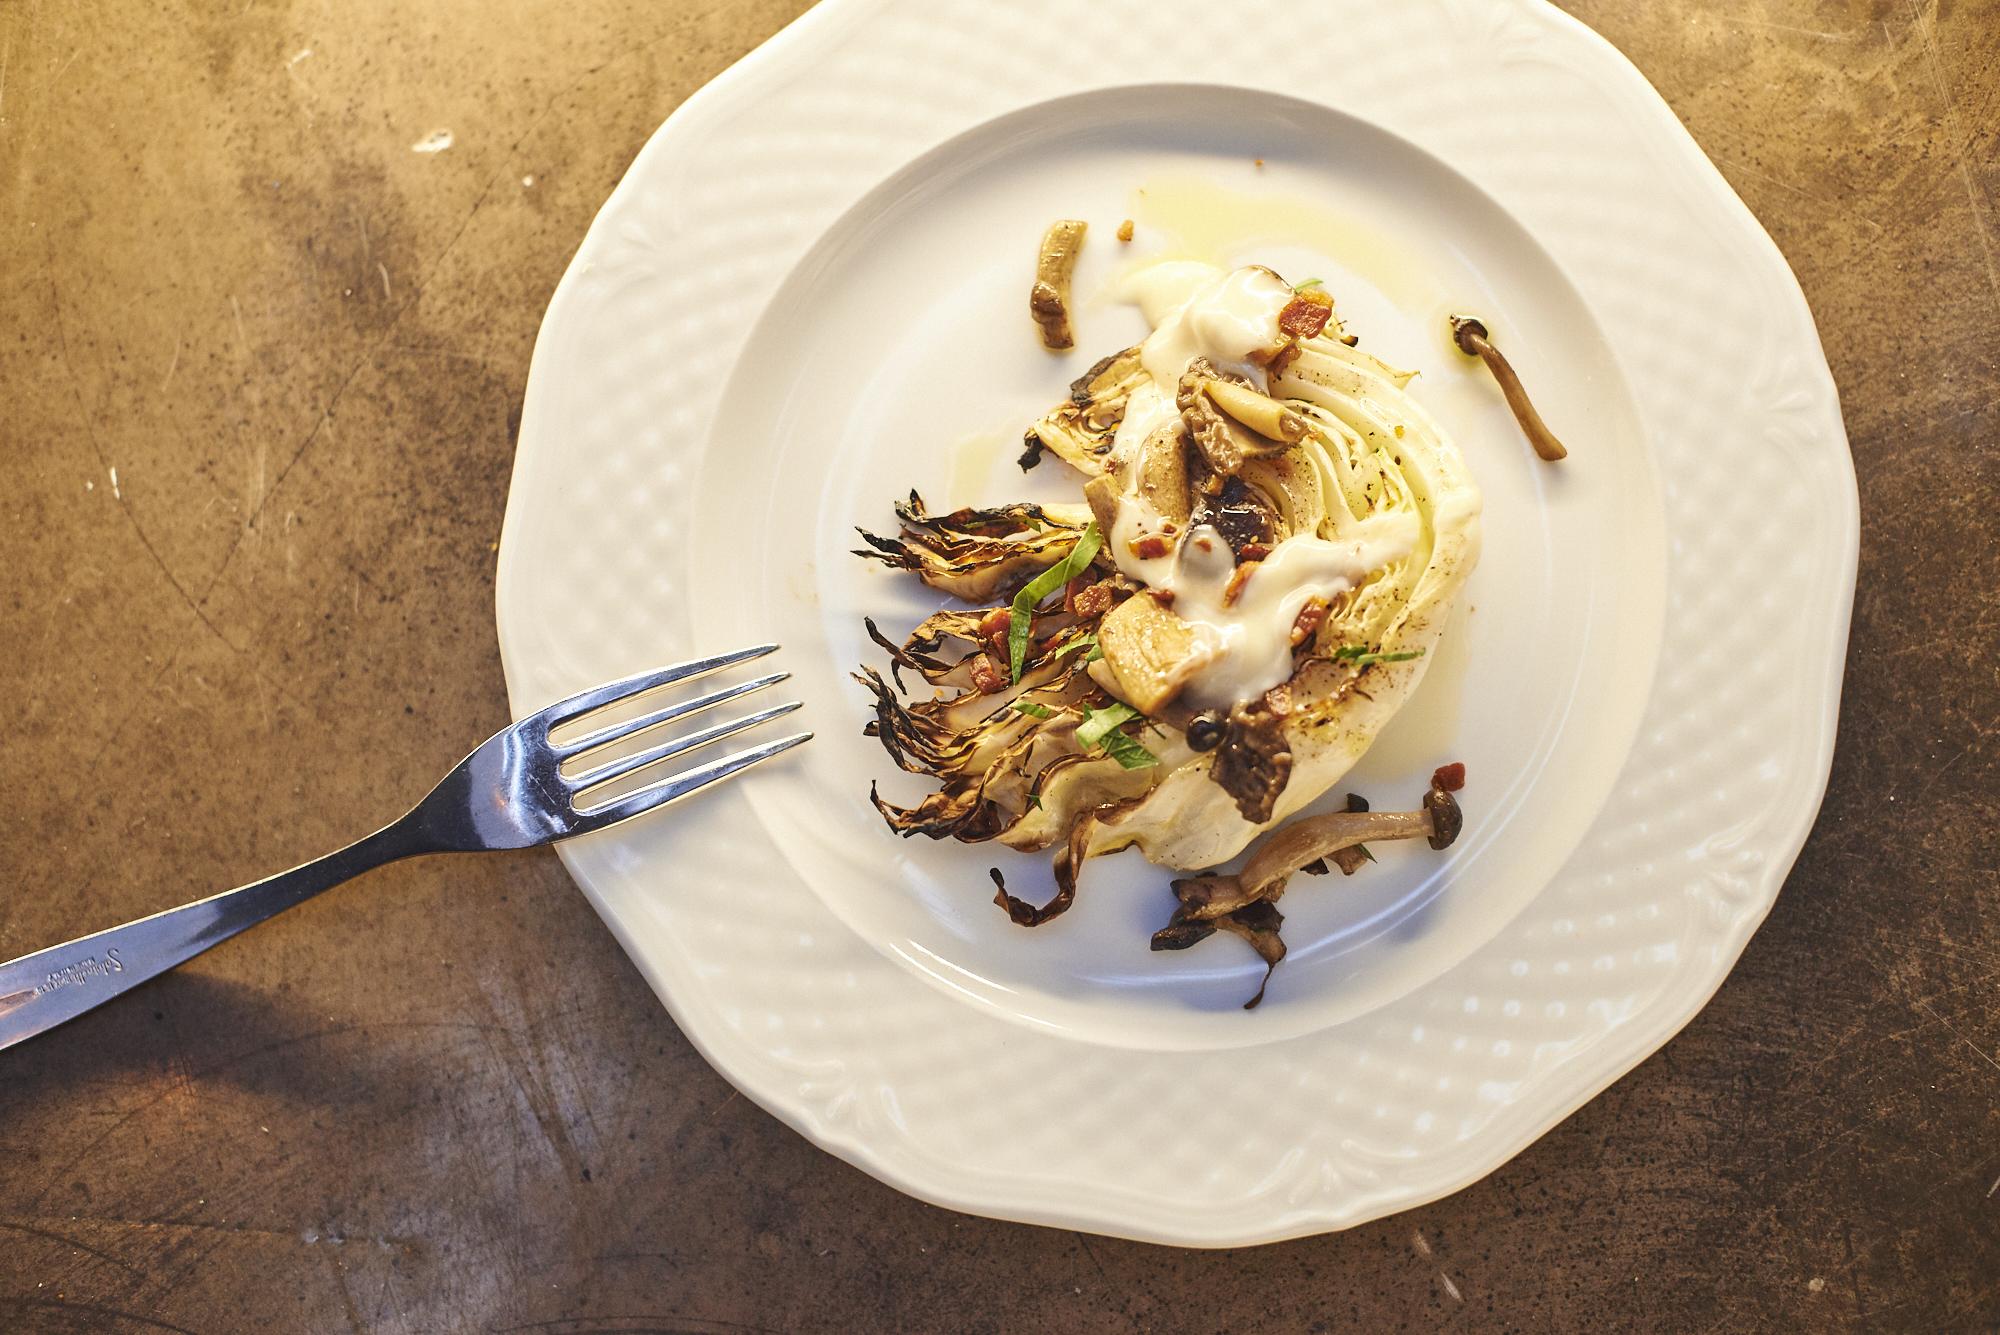 Marina O'Loughlin reviews Coal Drops Yard restaurant Hicce by Great British Menu winner Pip Lacey